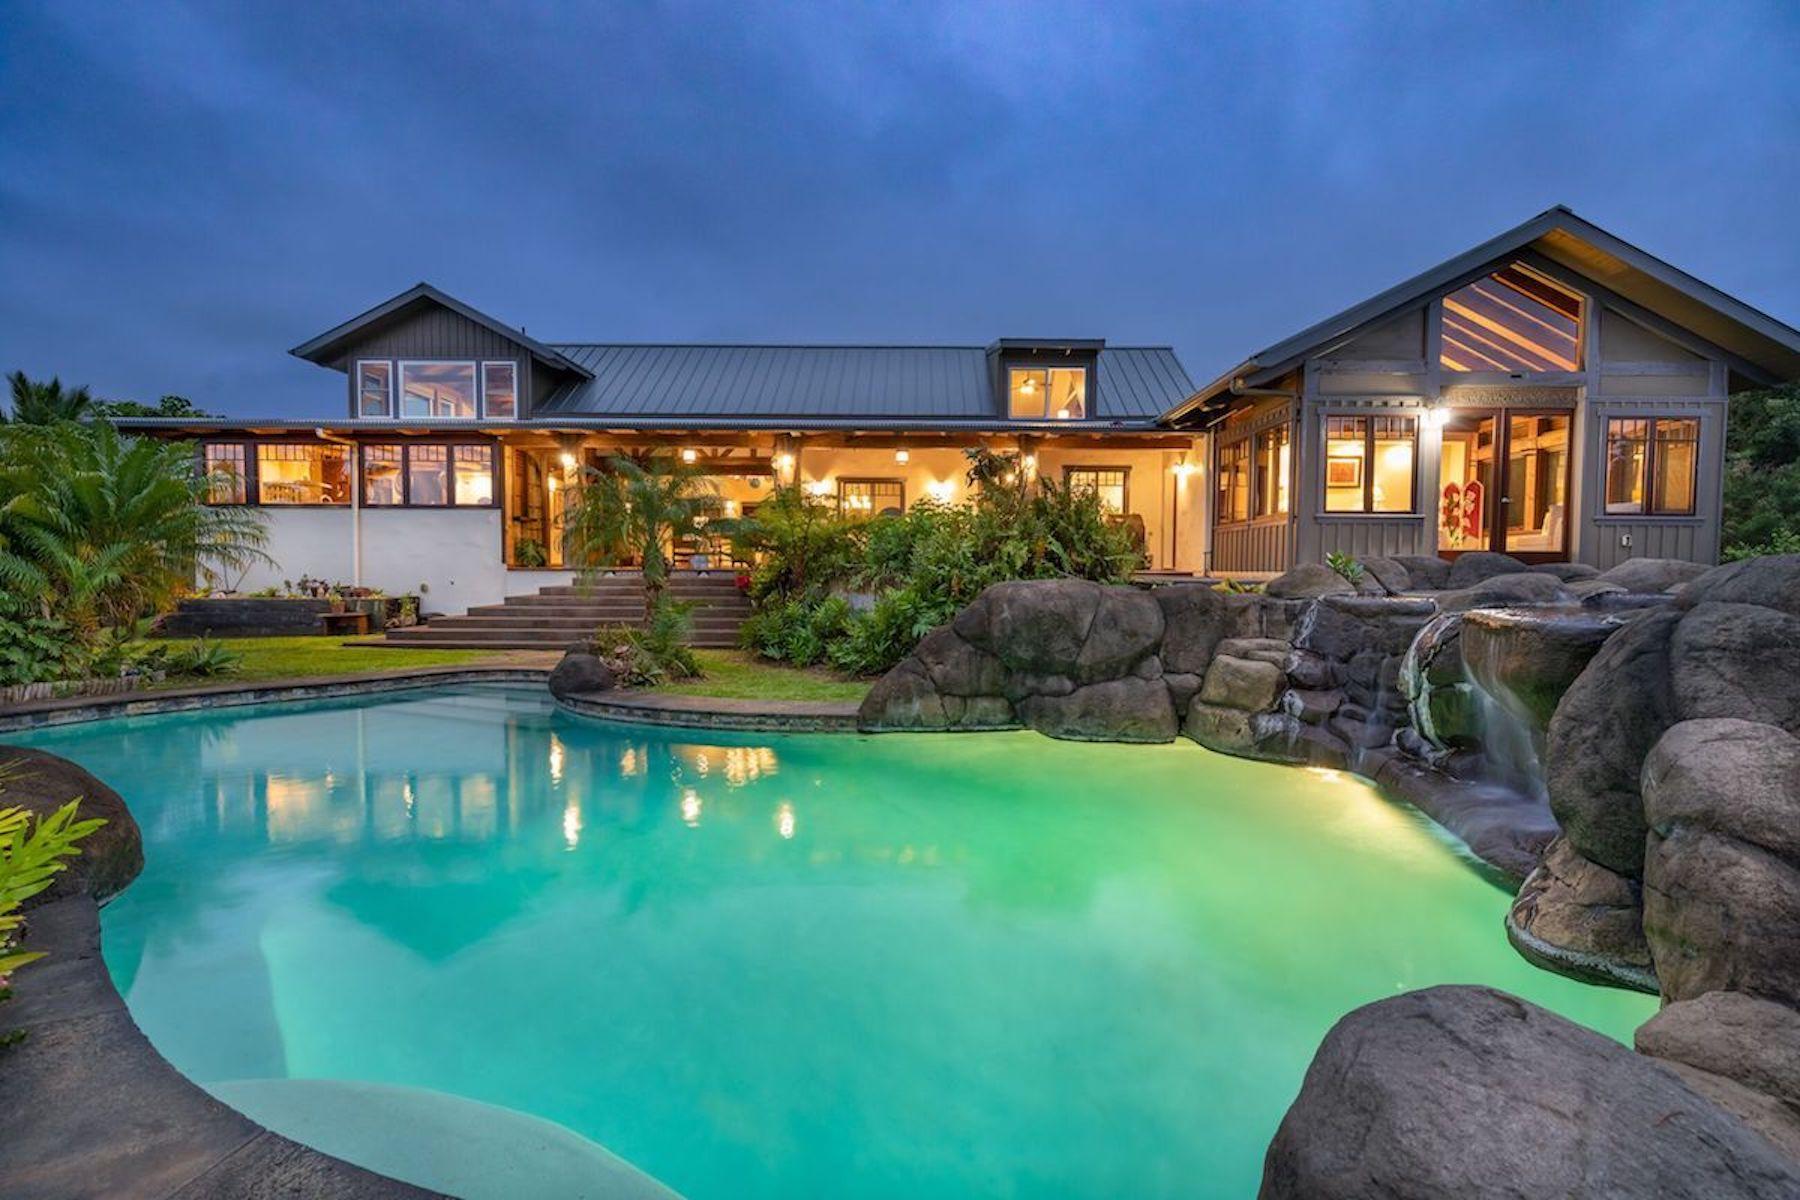 Single Family Home for Active at 54-563 Honomakau Rd Kapaau, Hawaii 96755 United States